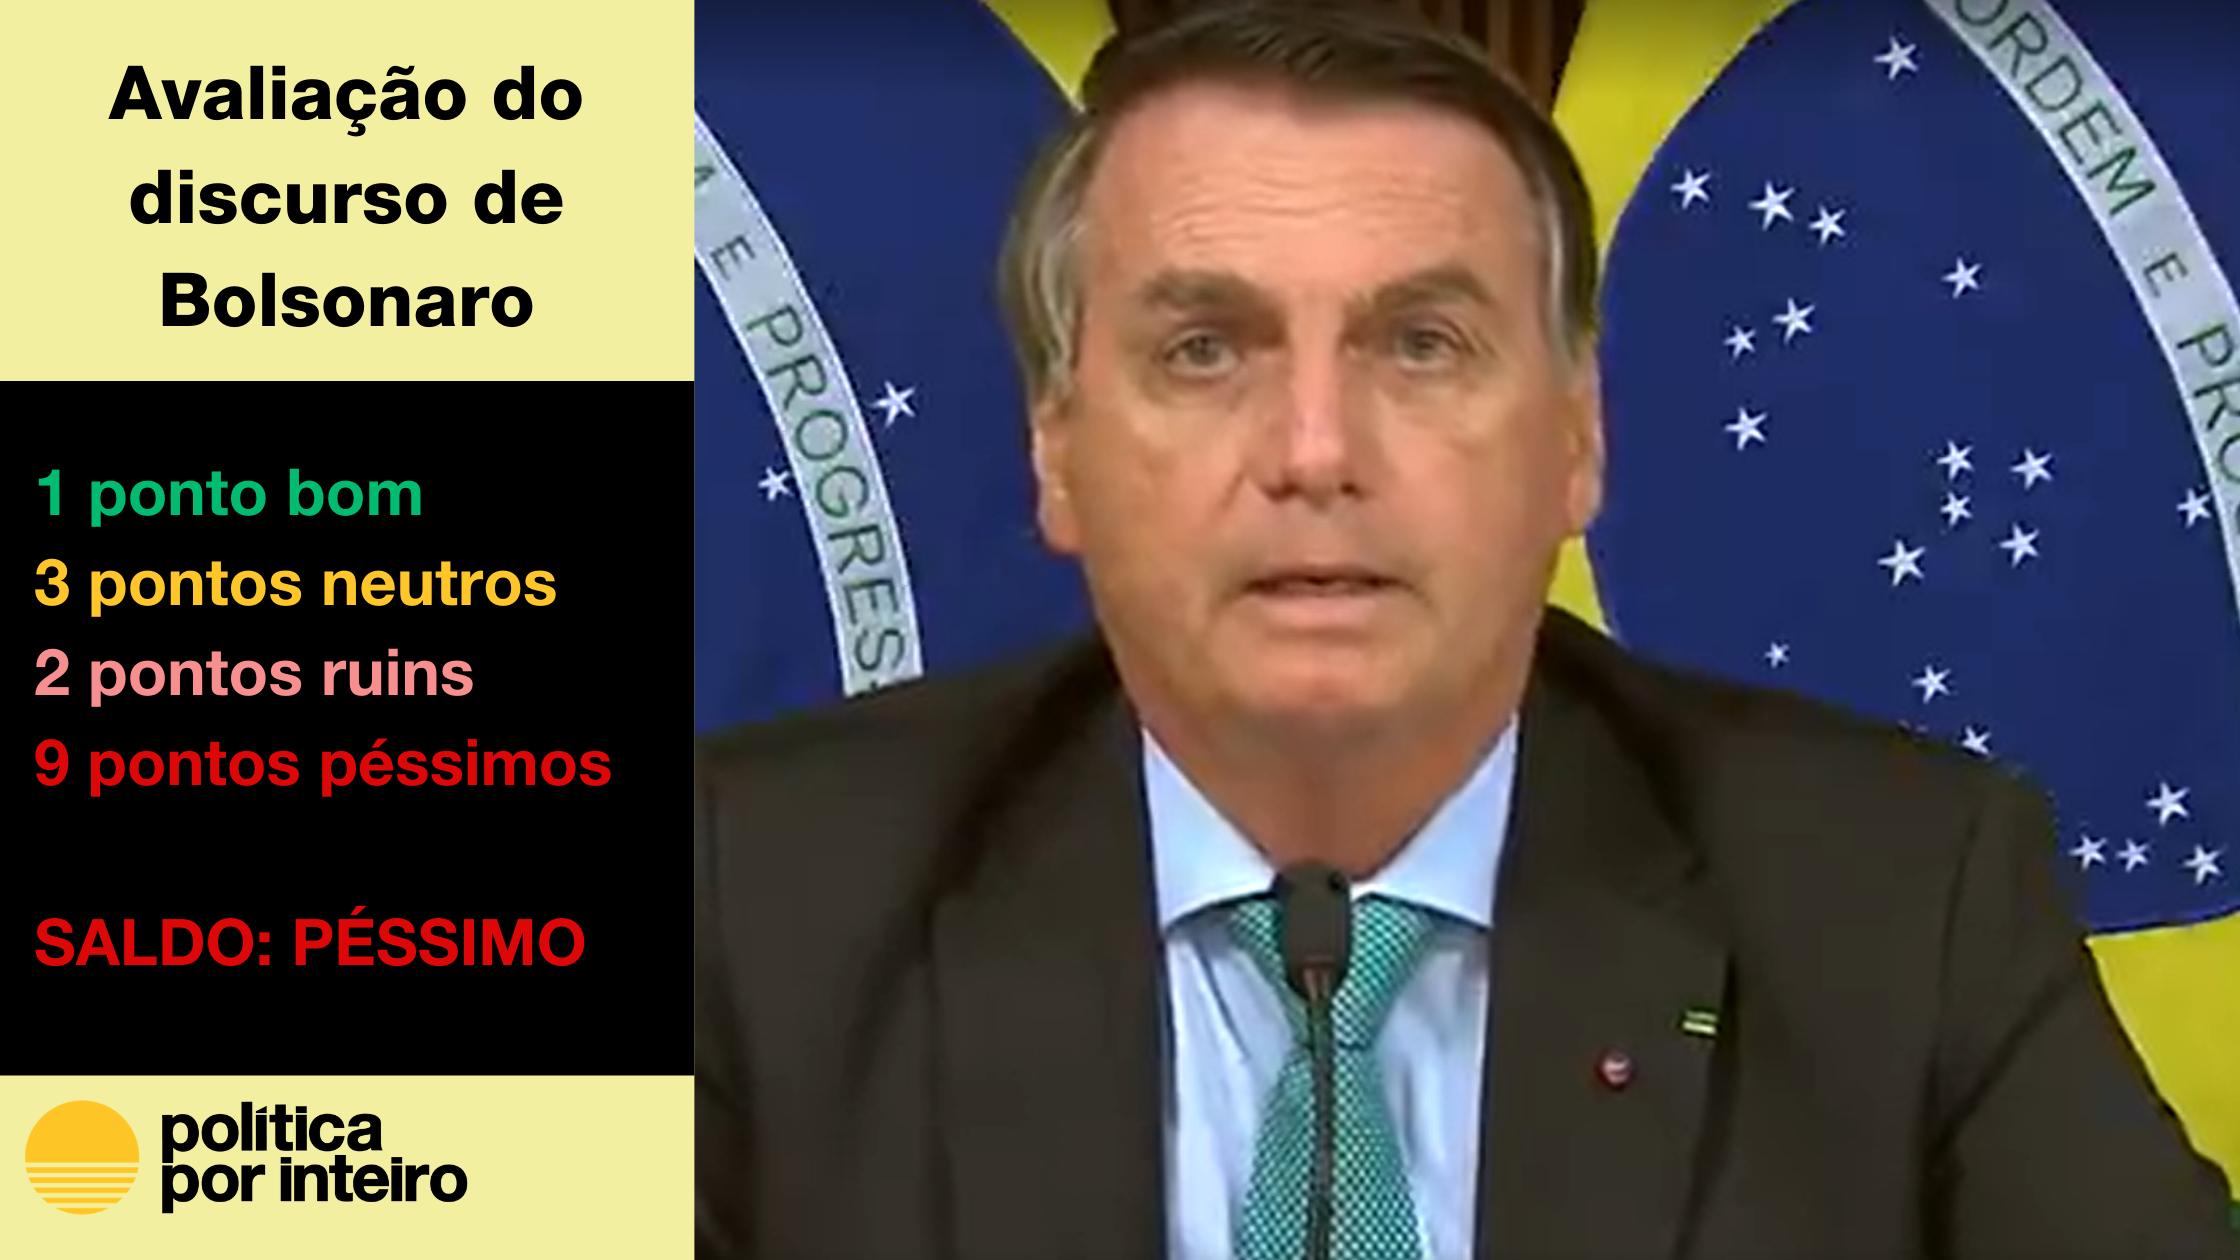 Imagem do presidente Bolsonaro discursando na Cúpula dos Líderes sobre Clima